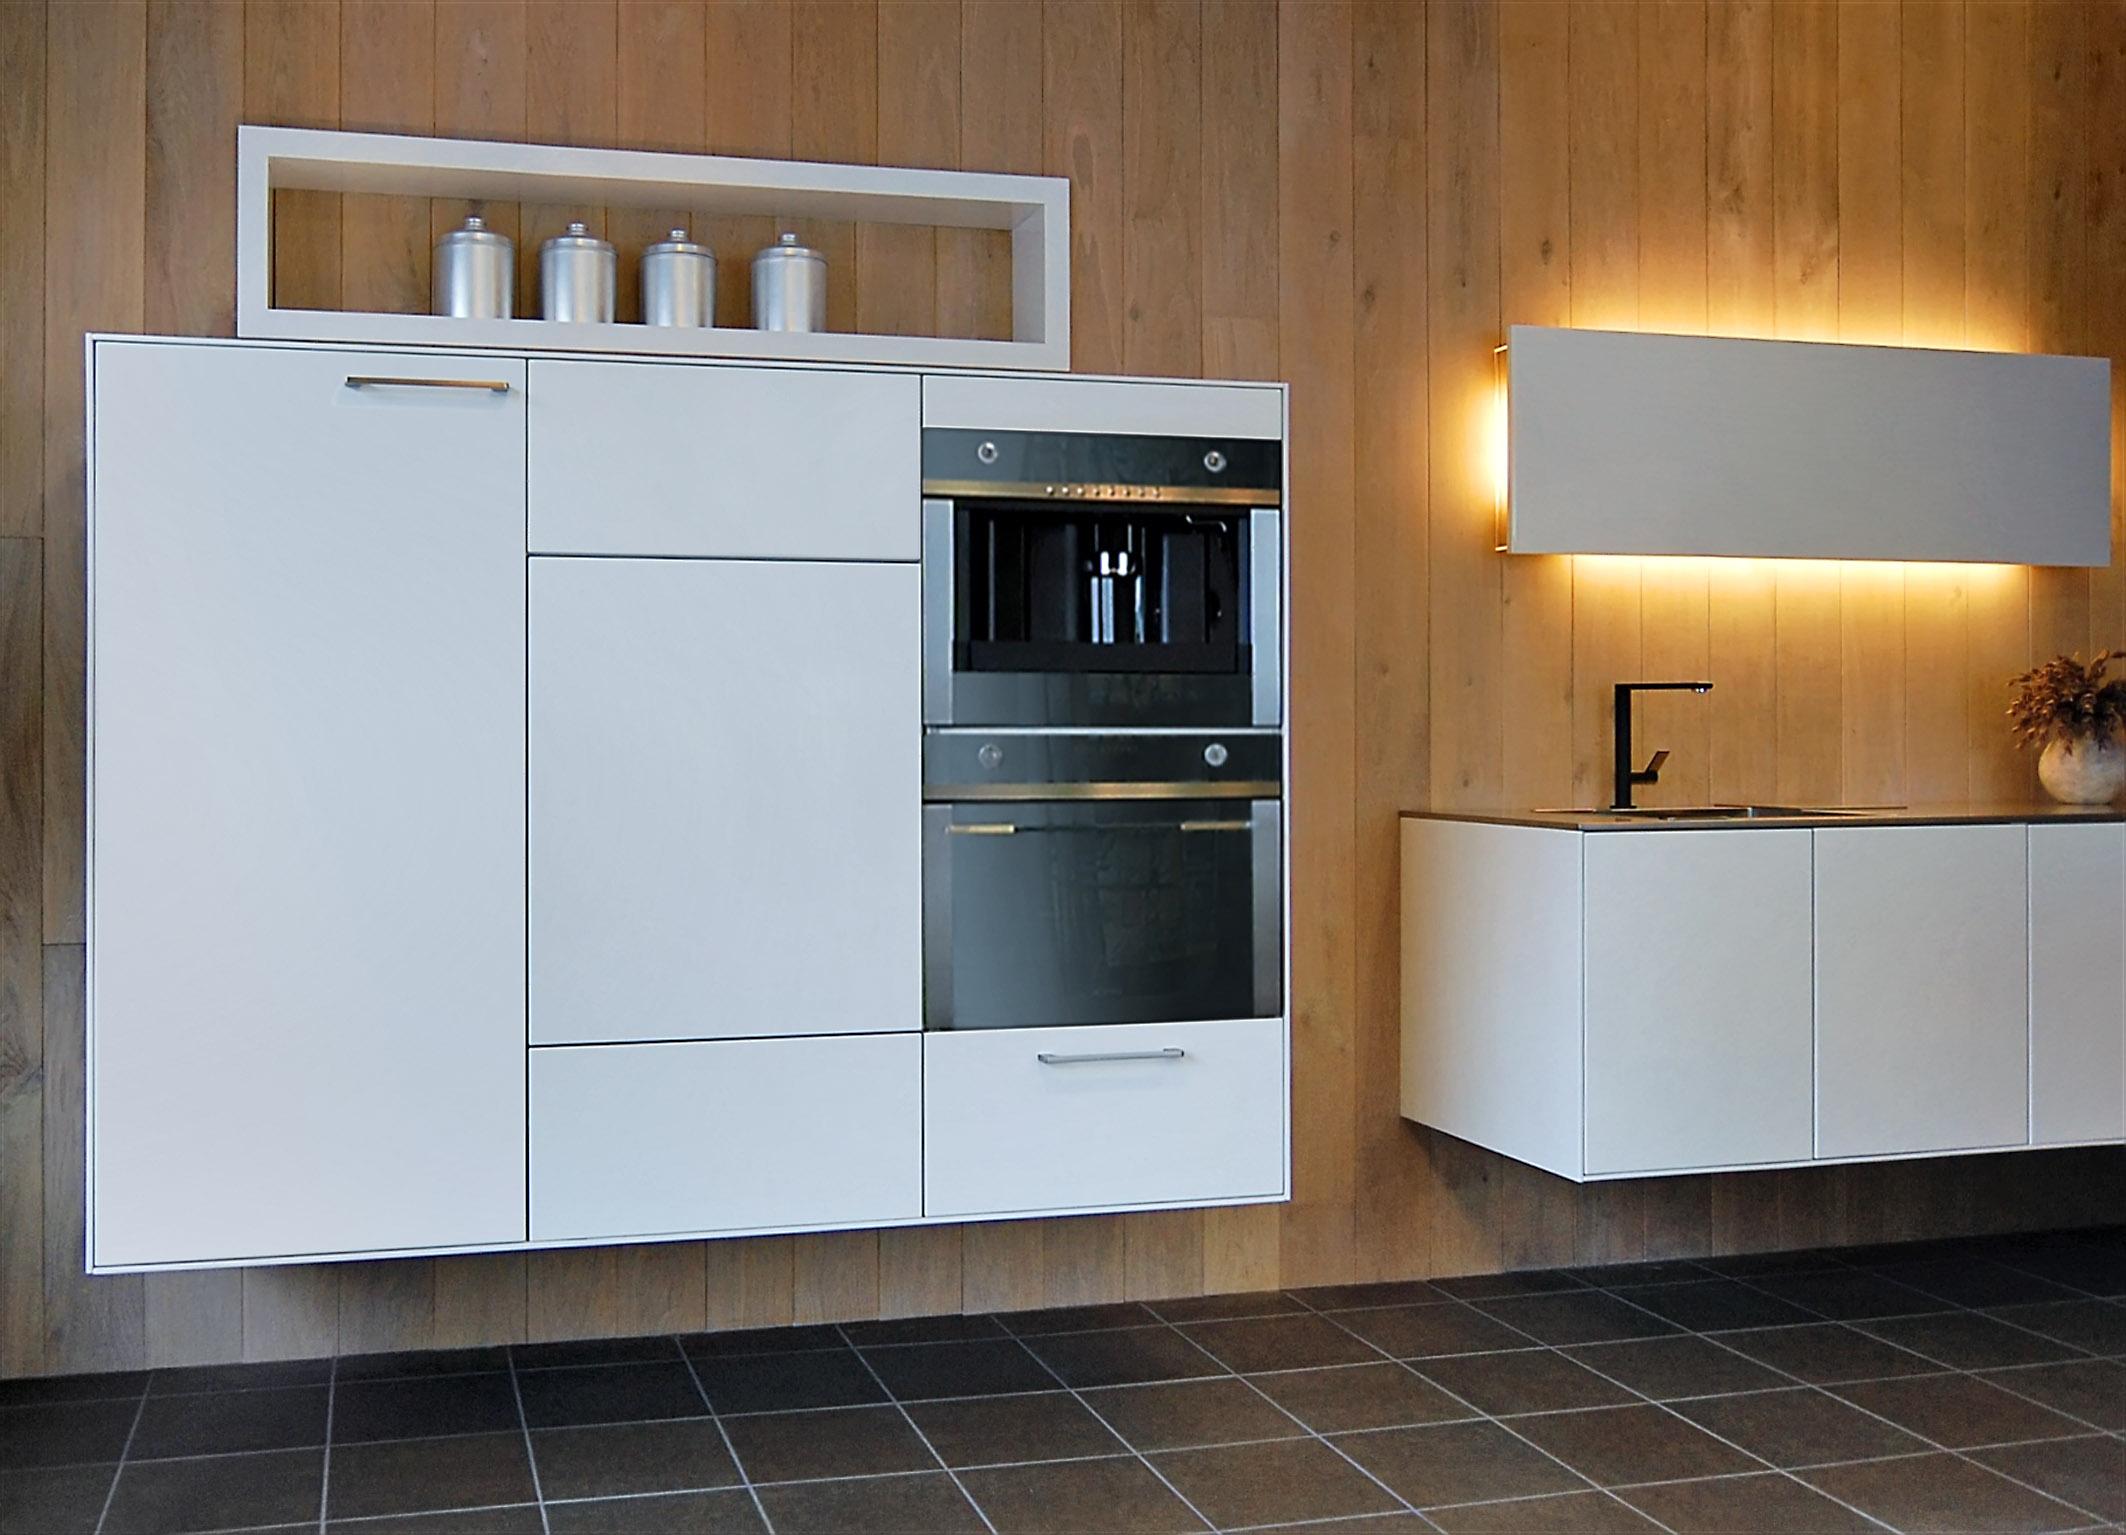 Keuken Wandkast 8 : Keukens hl keukens en kasten